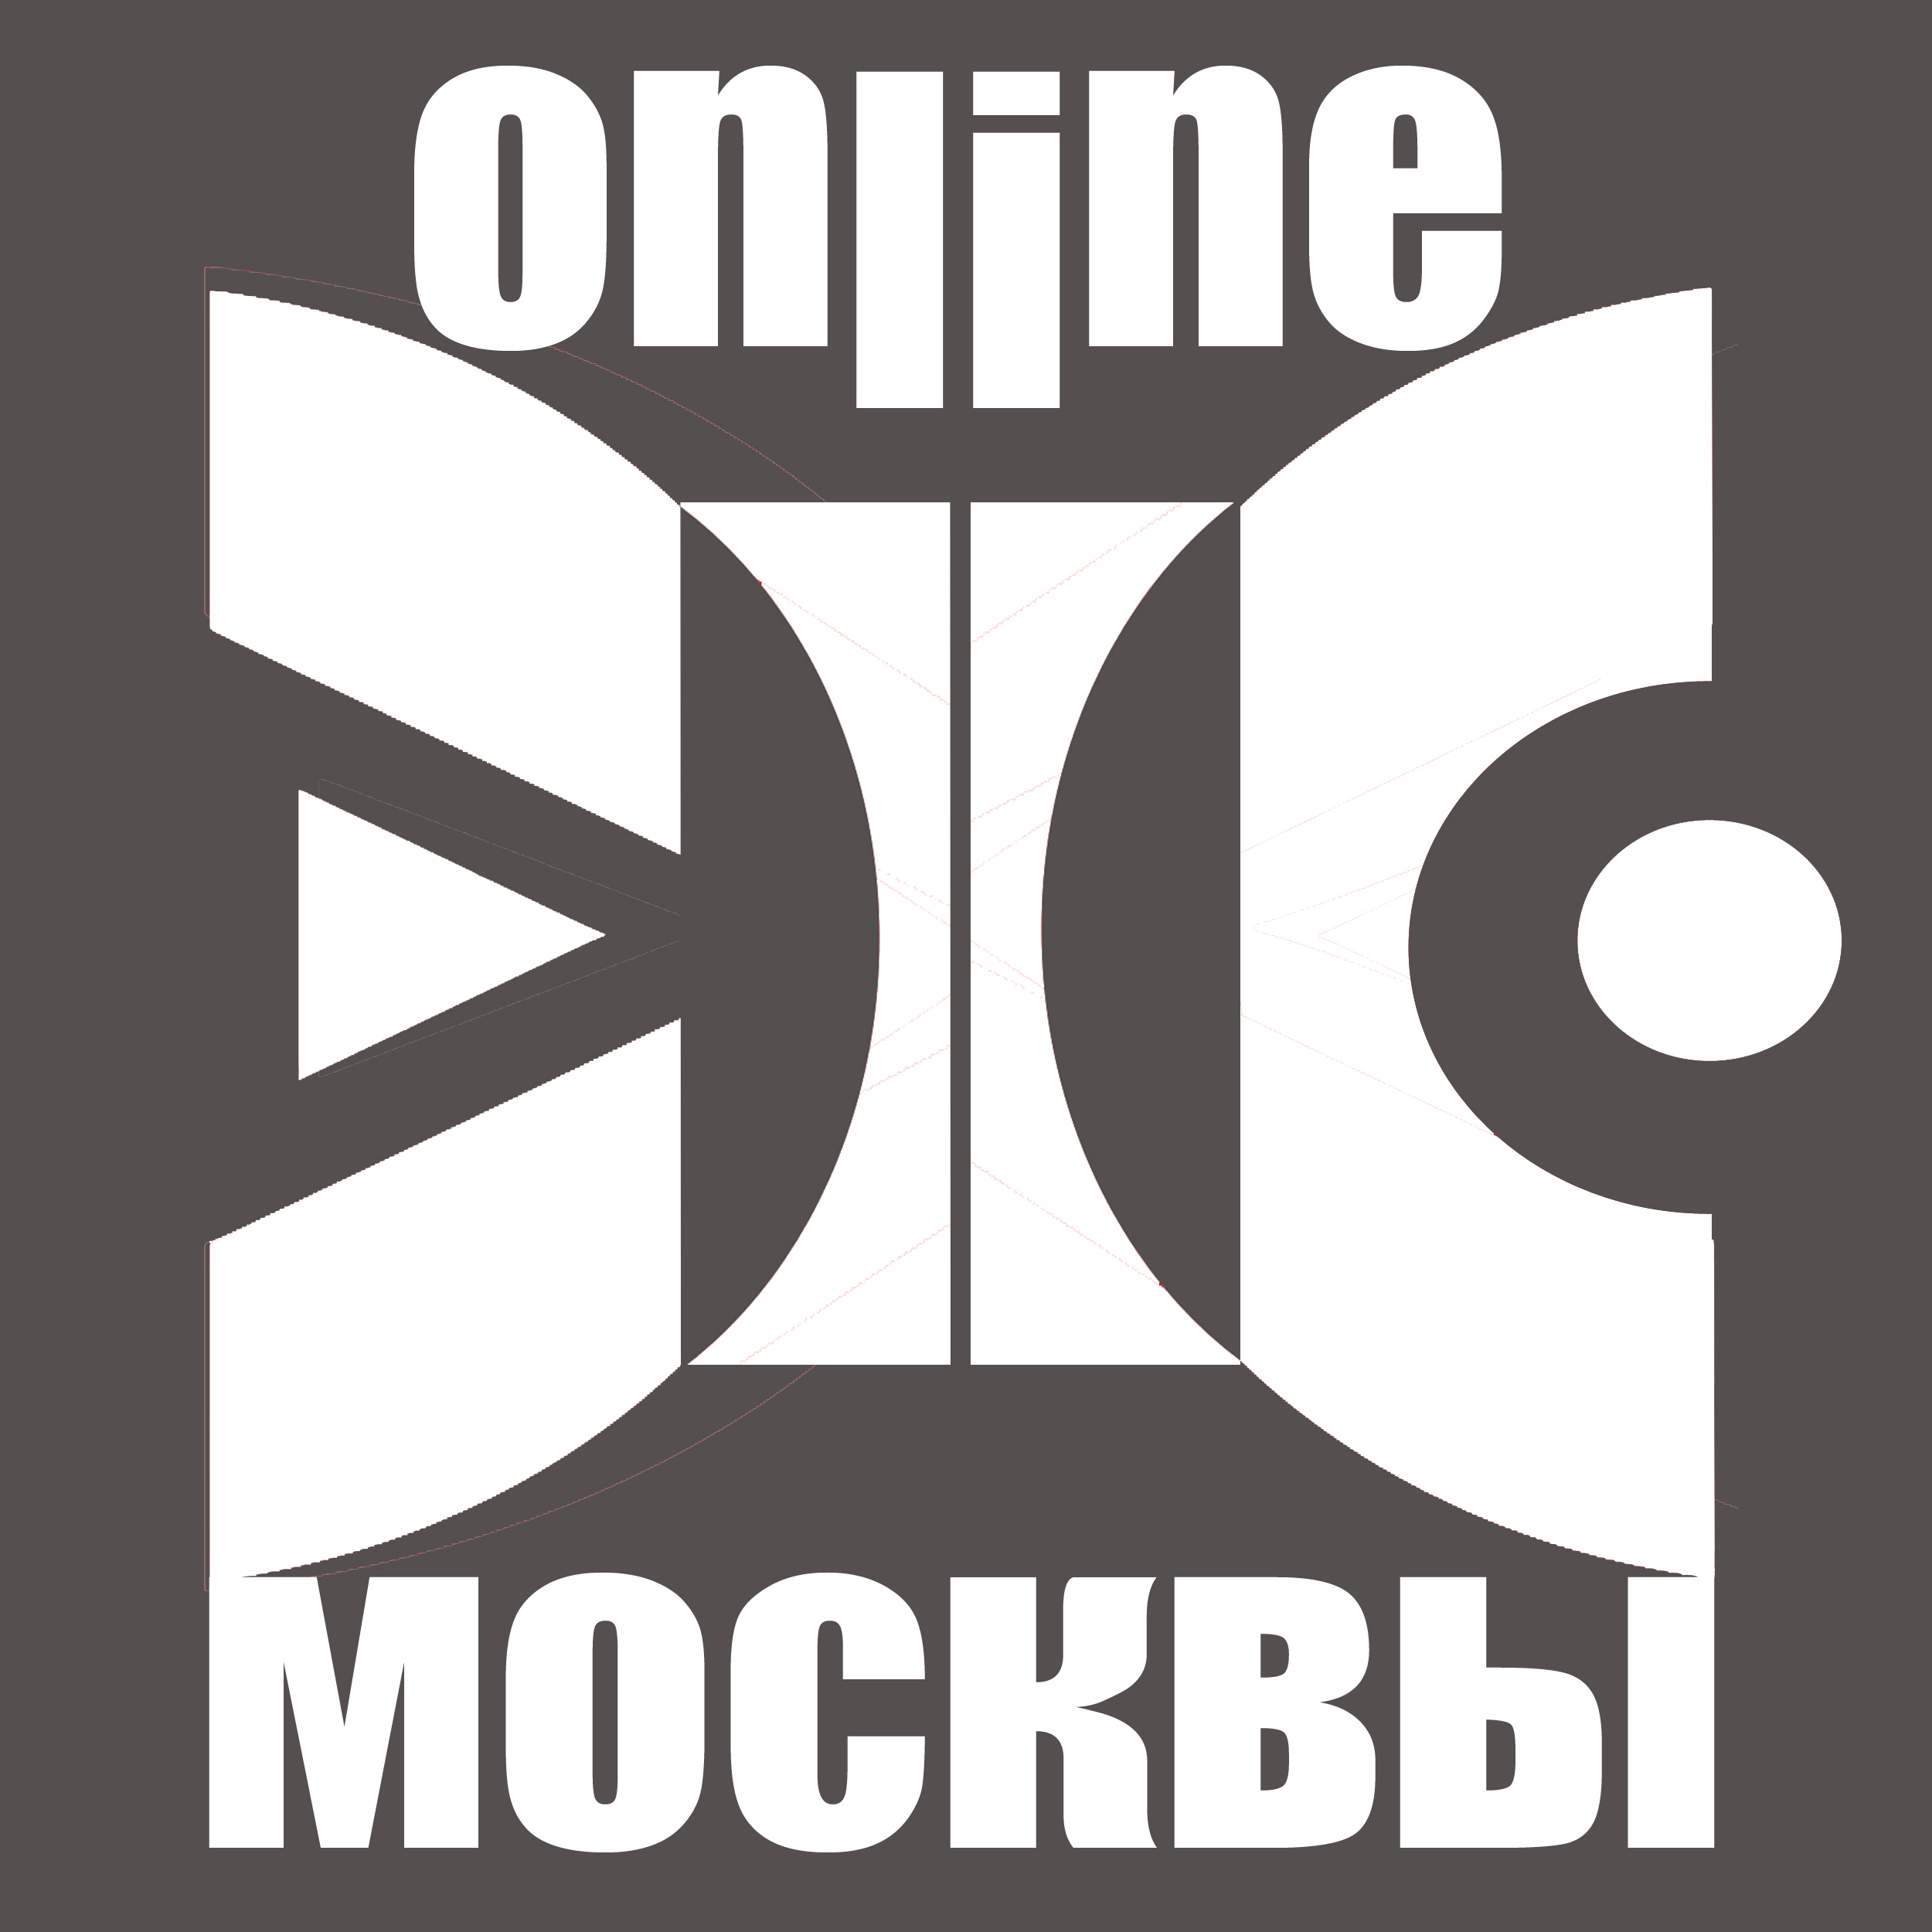 Дизайн логотипа р/с Эхо Москвы. фото f_723562543840a78f.jpg